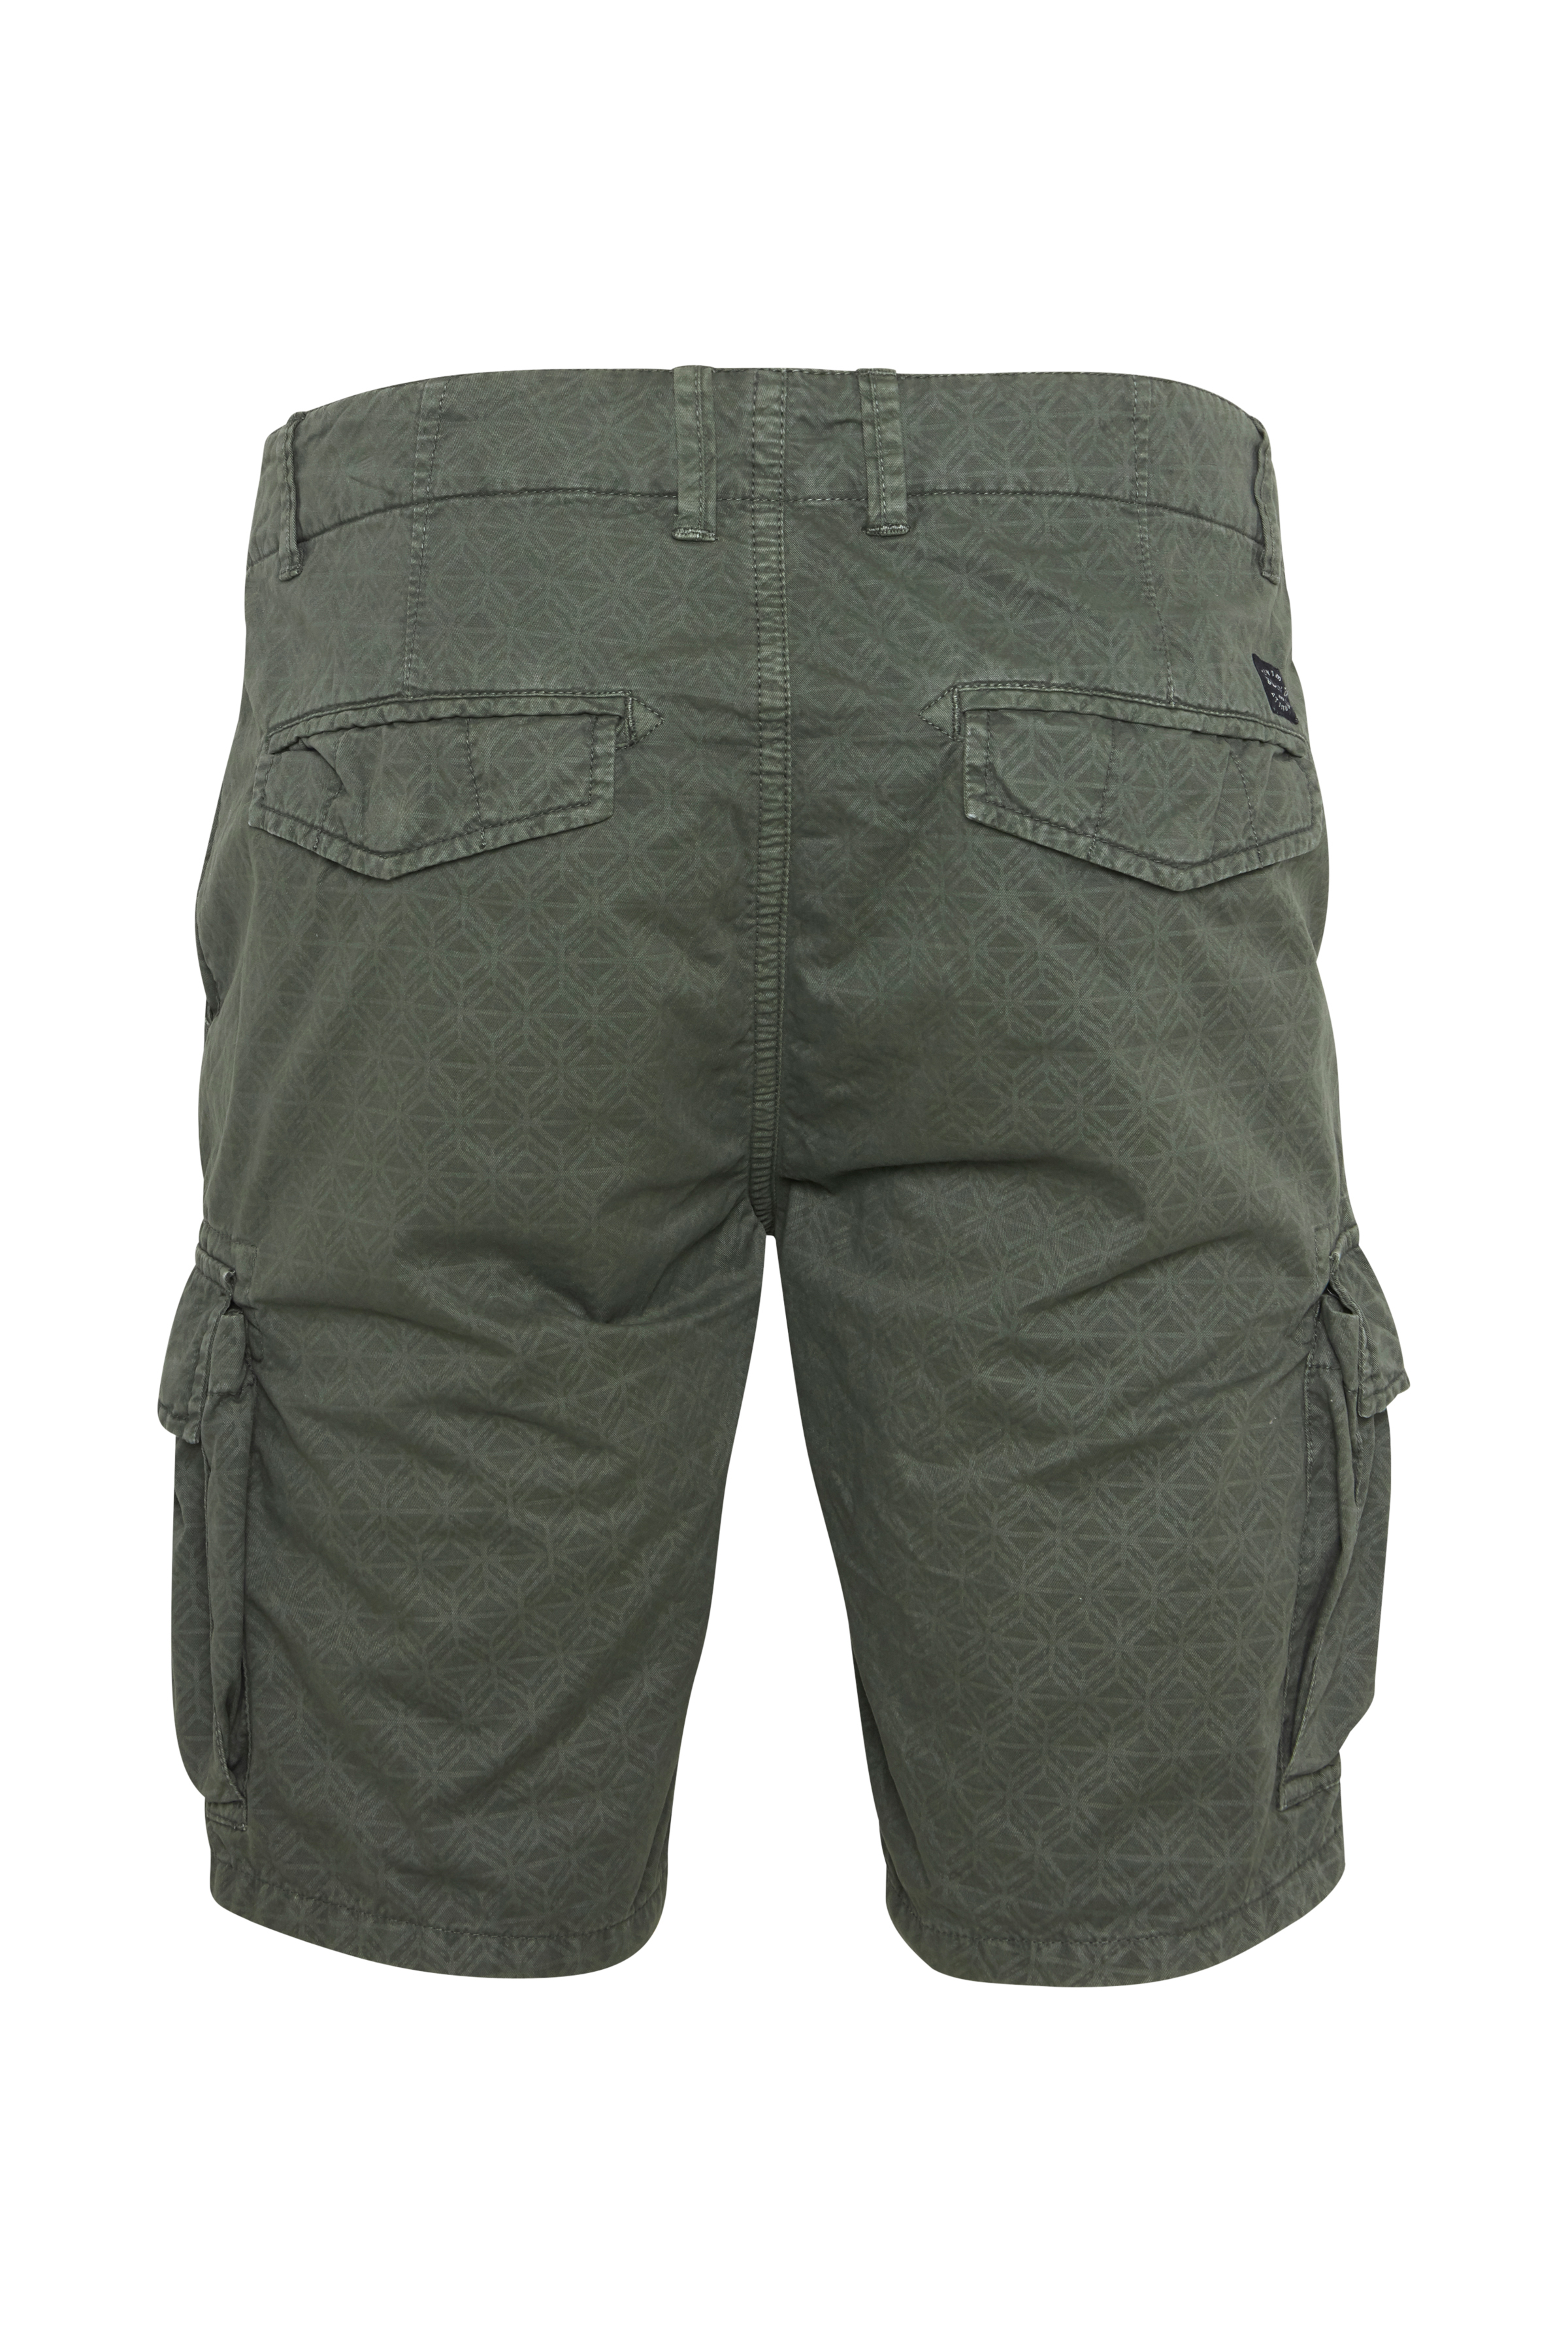 Beetle Green Shorts – Køb Beetle Green Shorts fra str. S-XXL her